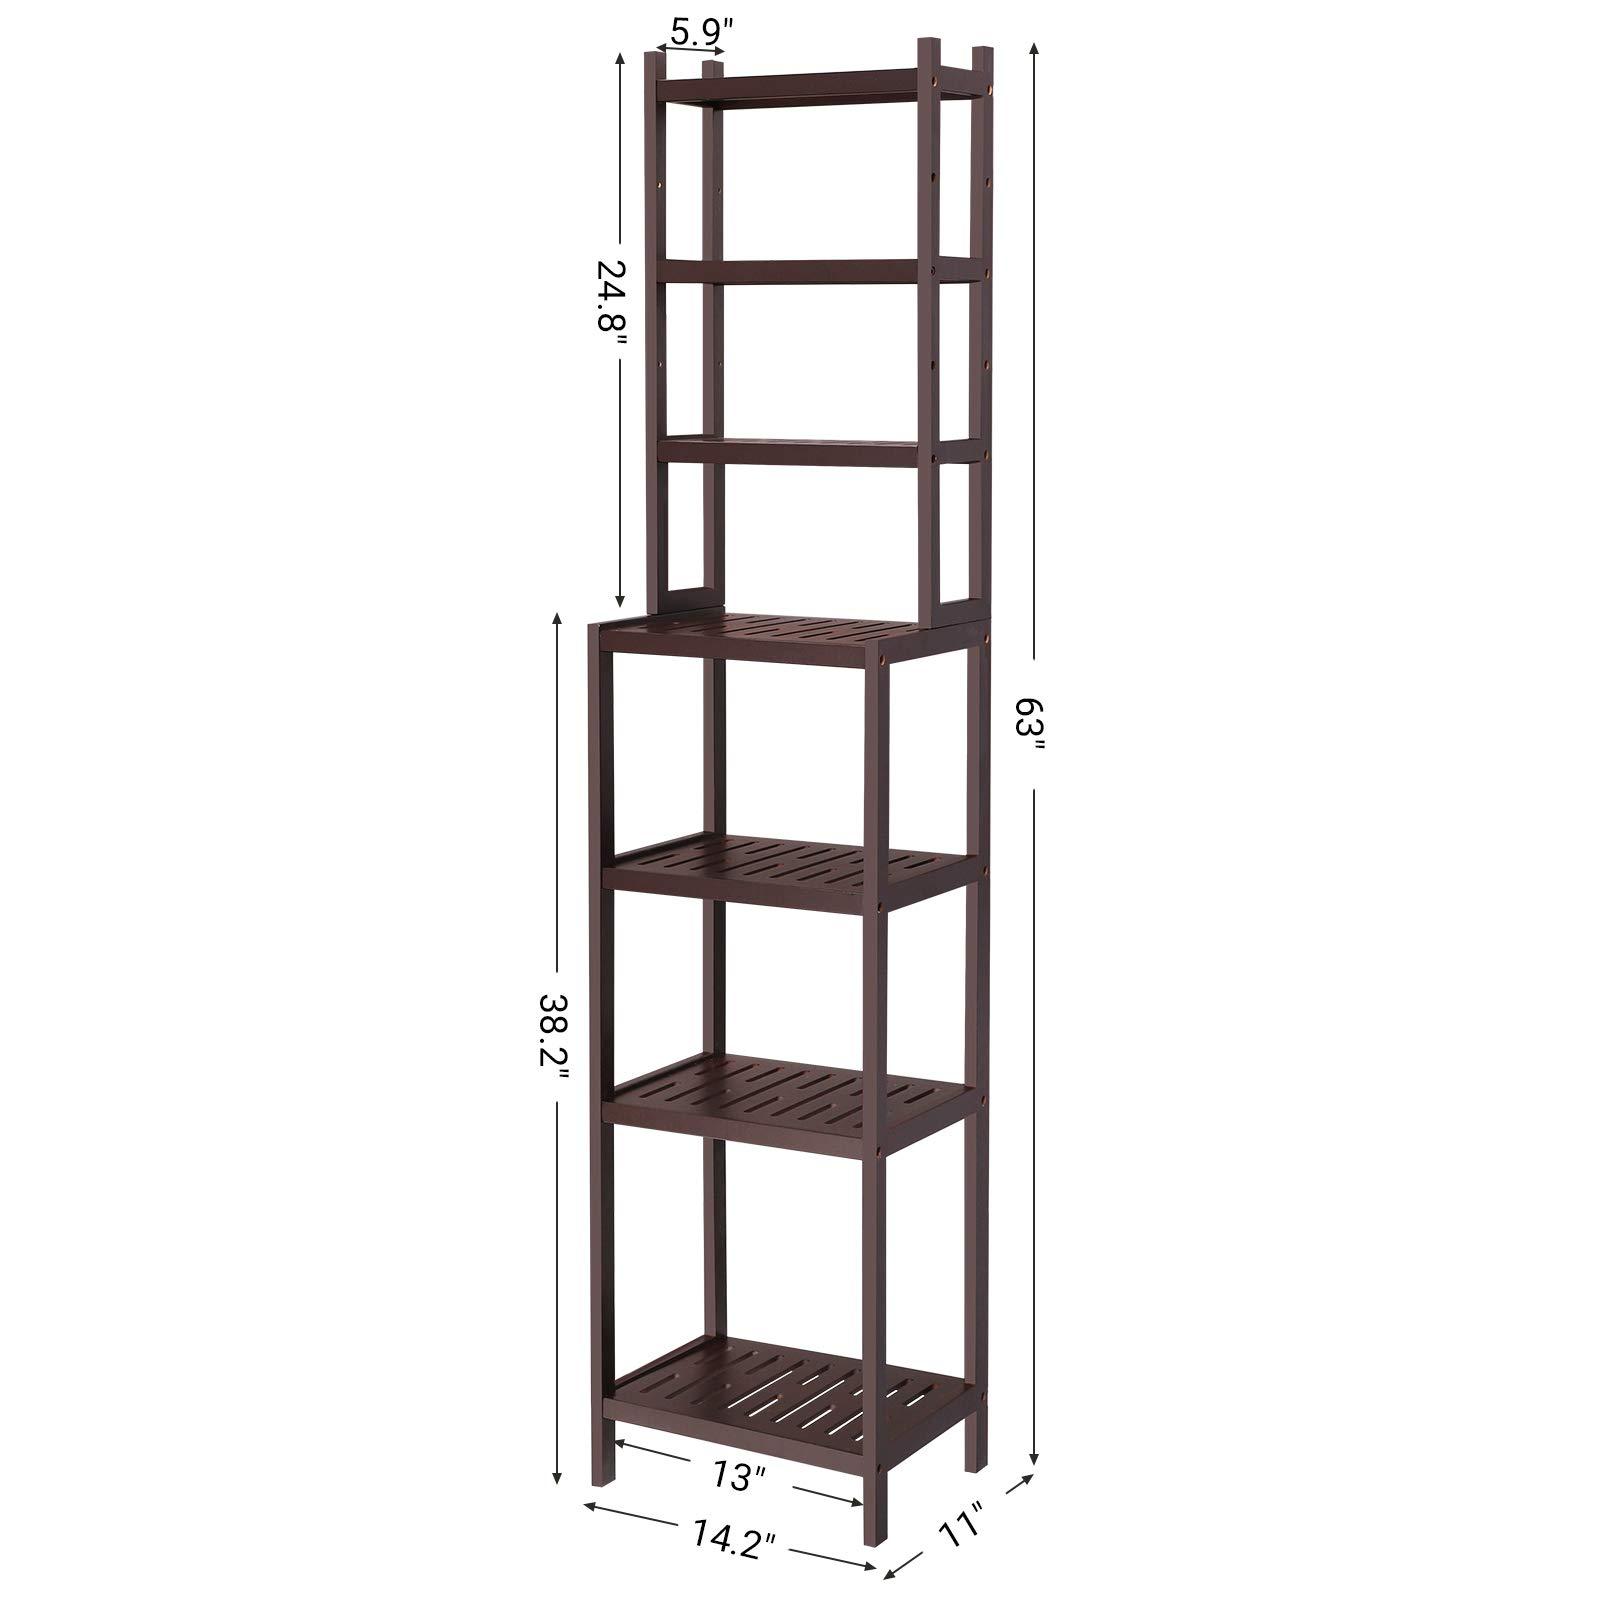 SONGMICS 7-Tier Bamboo Bathroom Shelf, 2-in-1 Design Adjustable Storage Rack, Free Standing Multifunctional Organizer, Shelving Unit for Washroom, Living Room, Kitchen, Brown UBCR01BR by SONGMICS (Image #6)